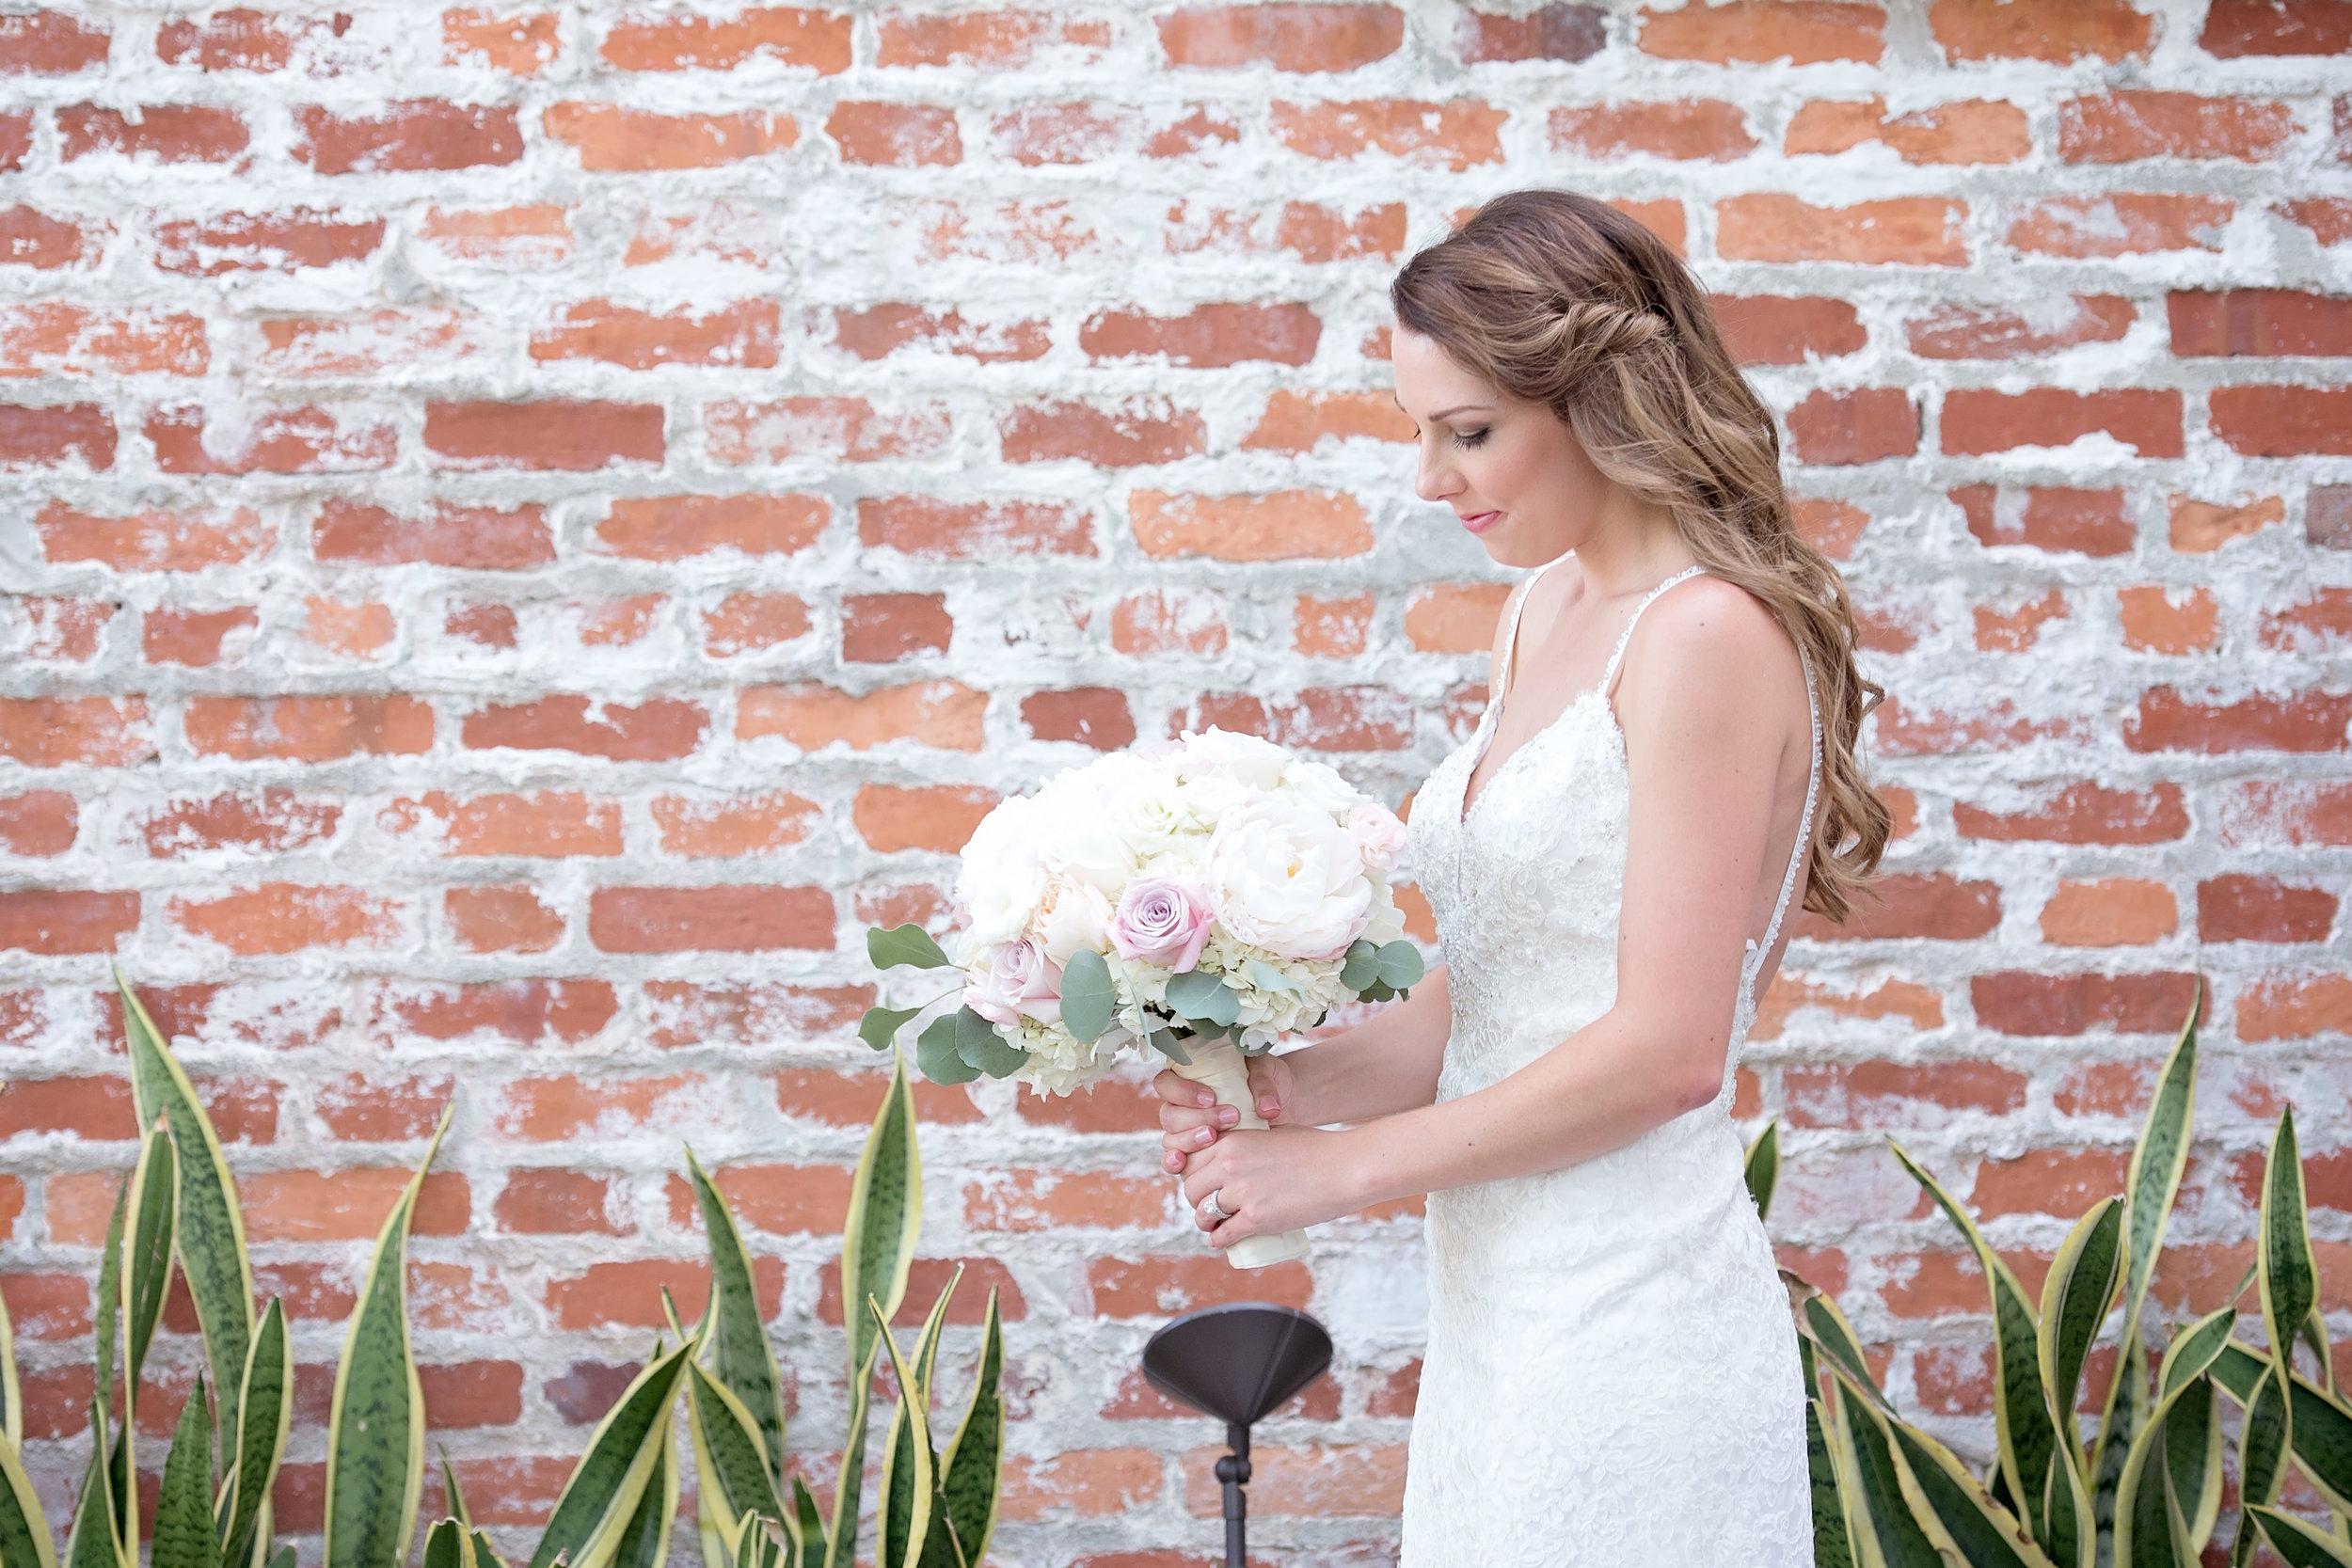 White Wedding Decor - Blush and White Wedding - Los Feliz Wedding